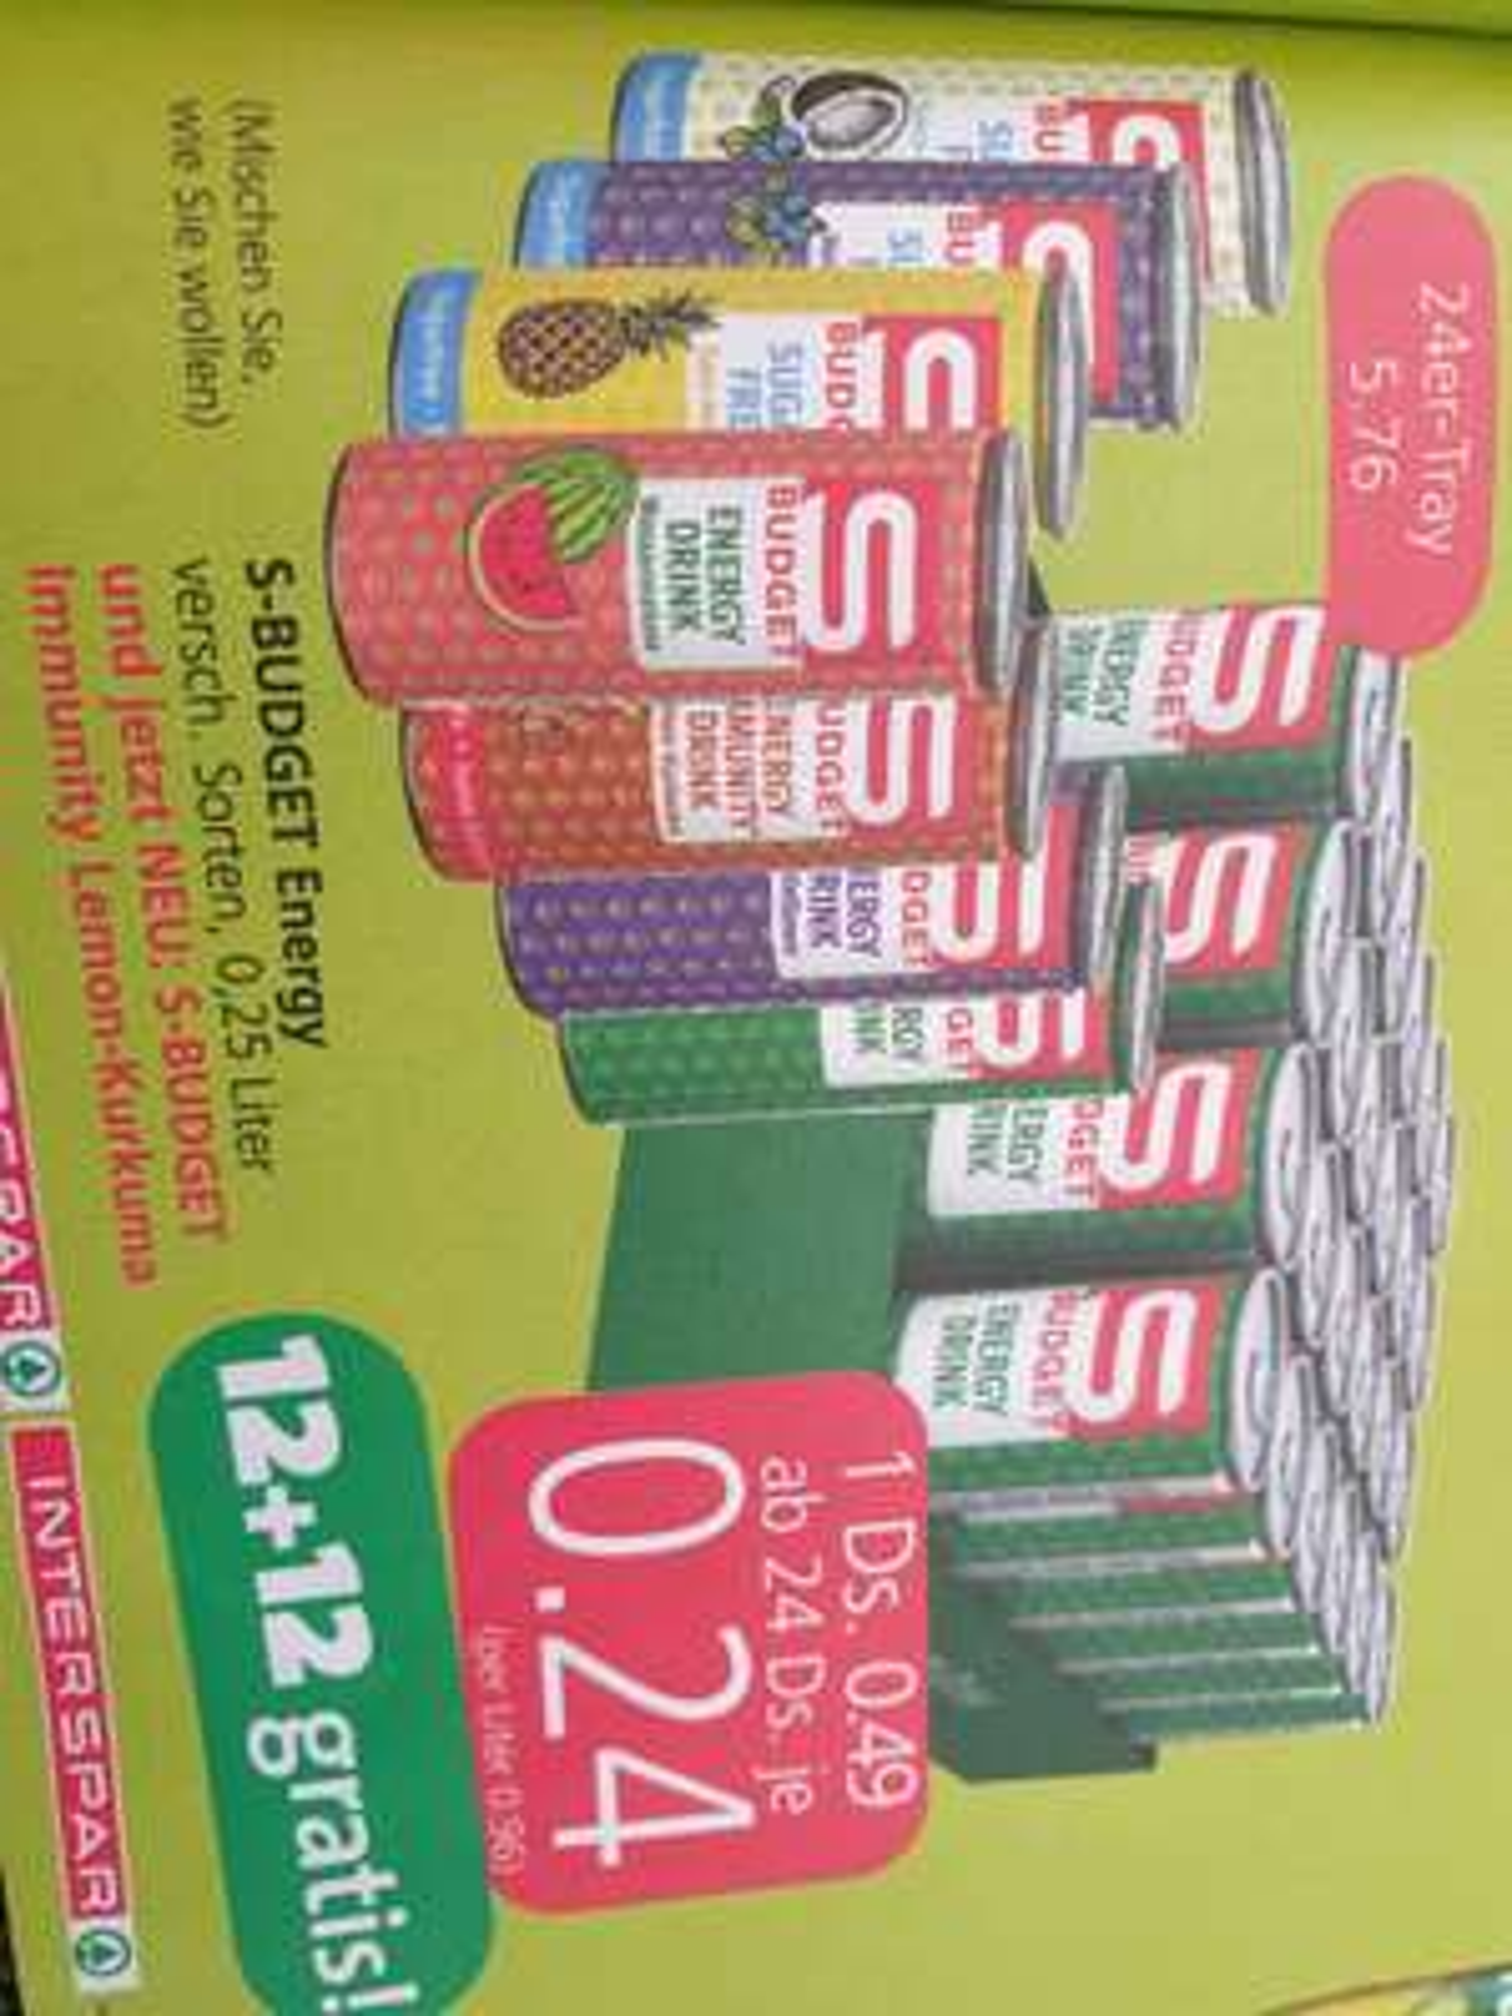 S-Budget Energy Drink ab 24 Dosen € 0.24 je Dose, 12+12 gratis